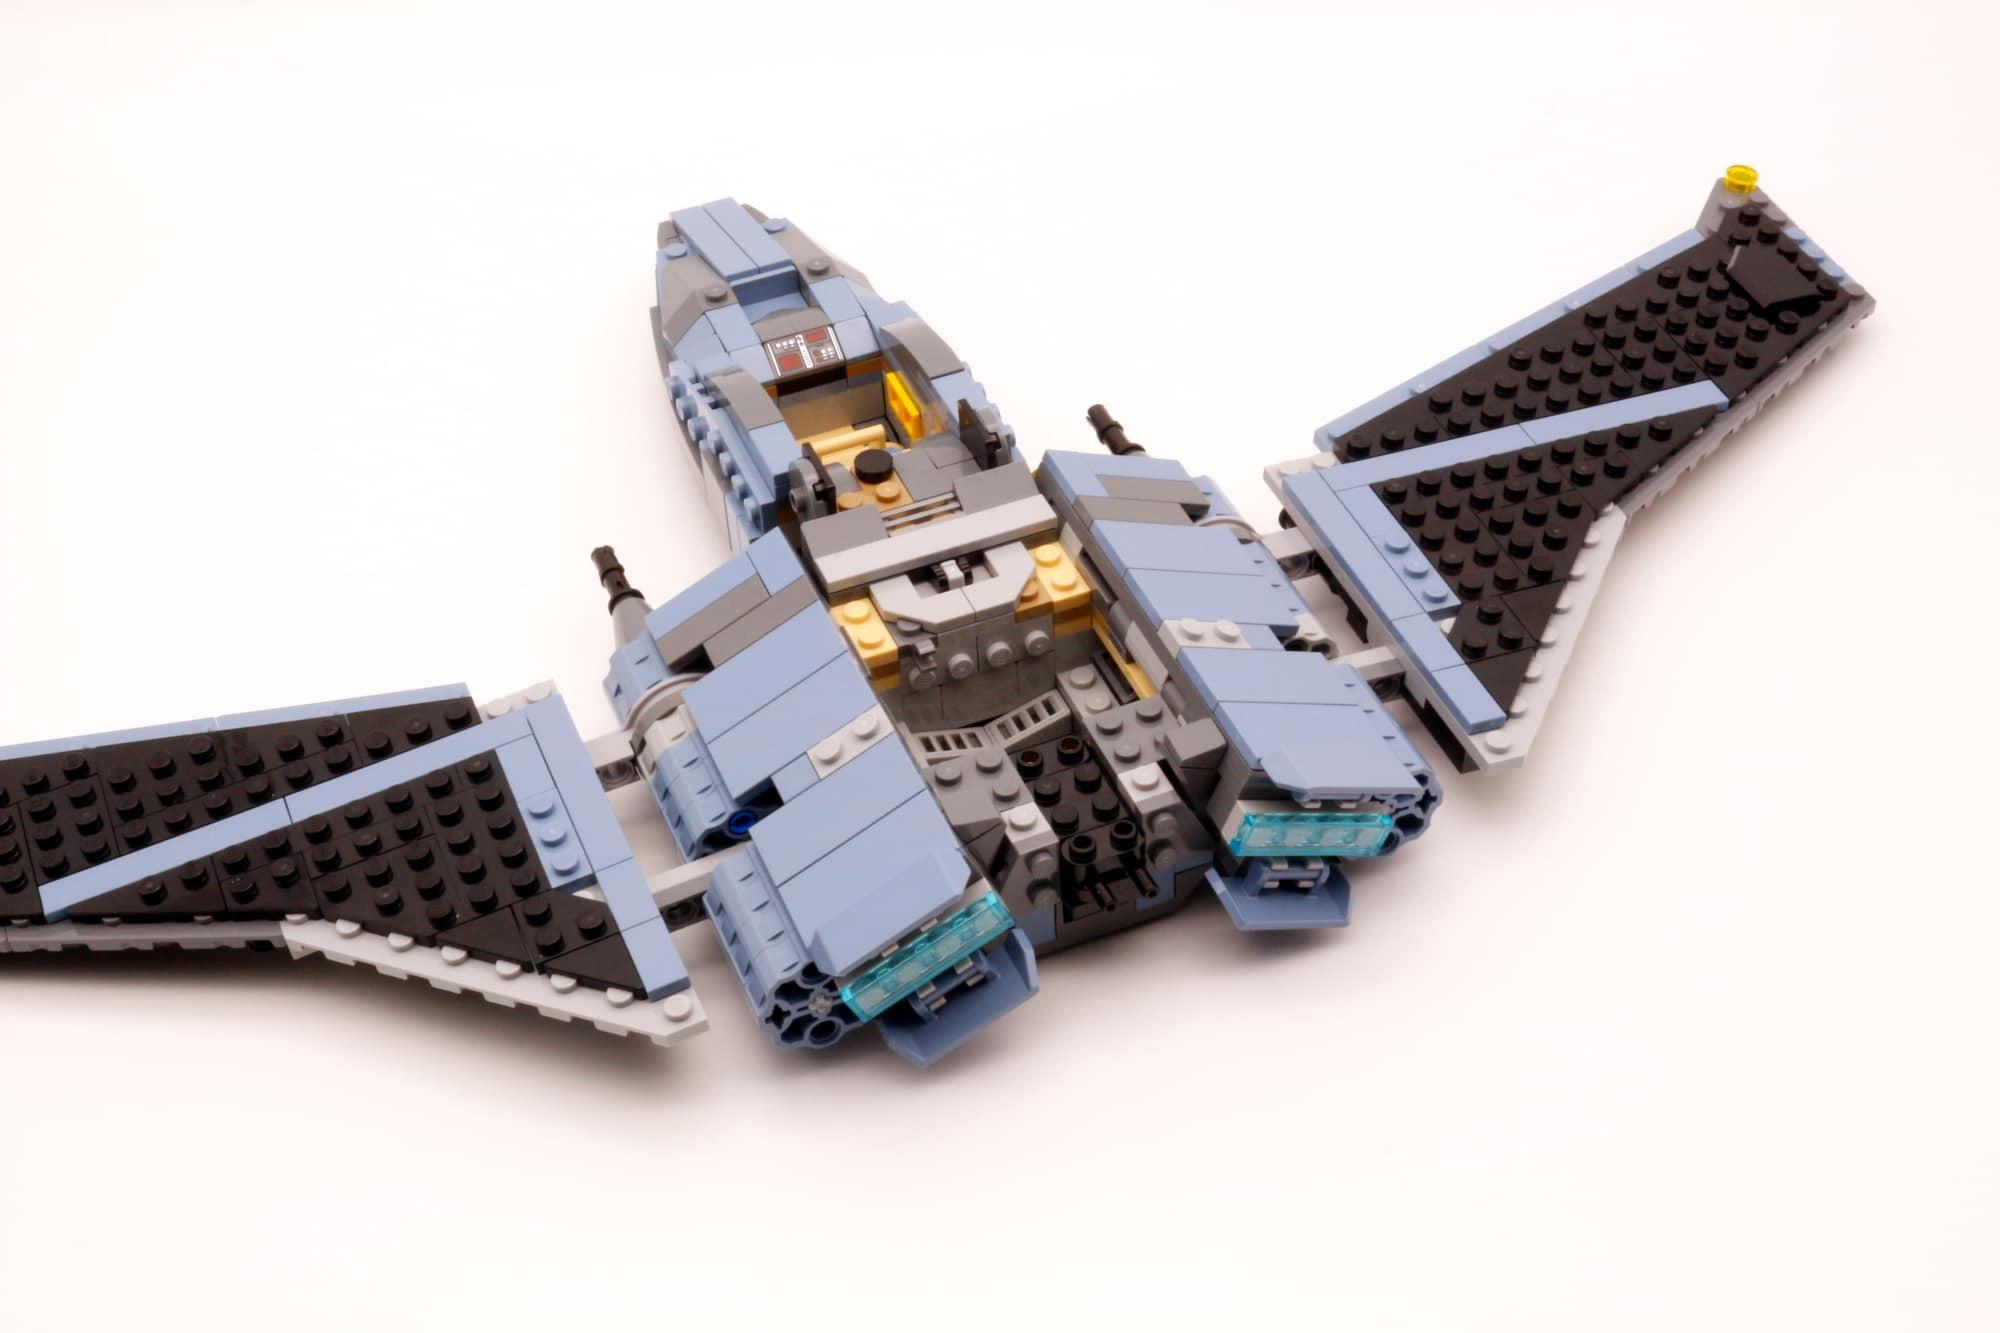 LEGO Star Wars 75314 The Bad Batch Attack Shuttle 7